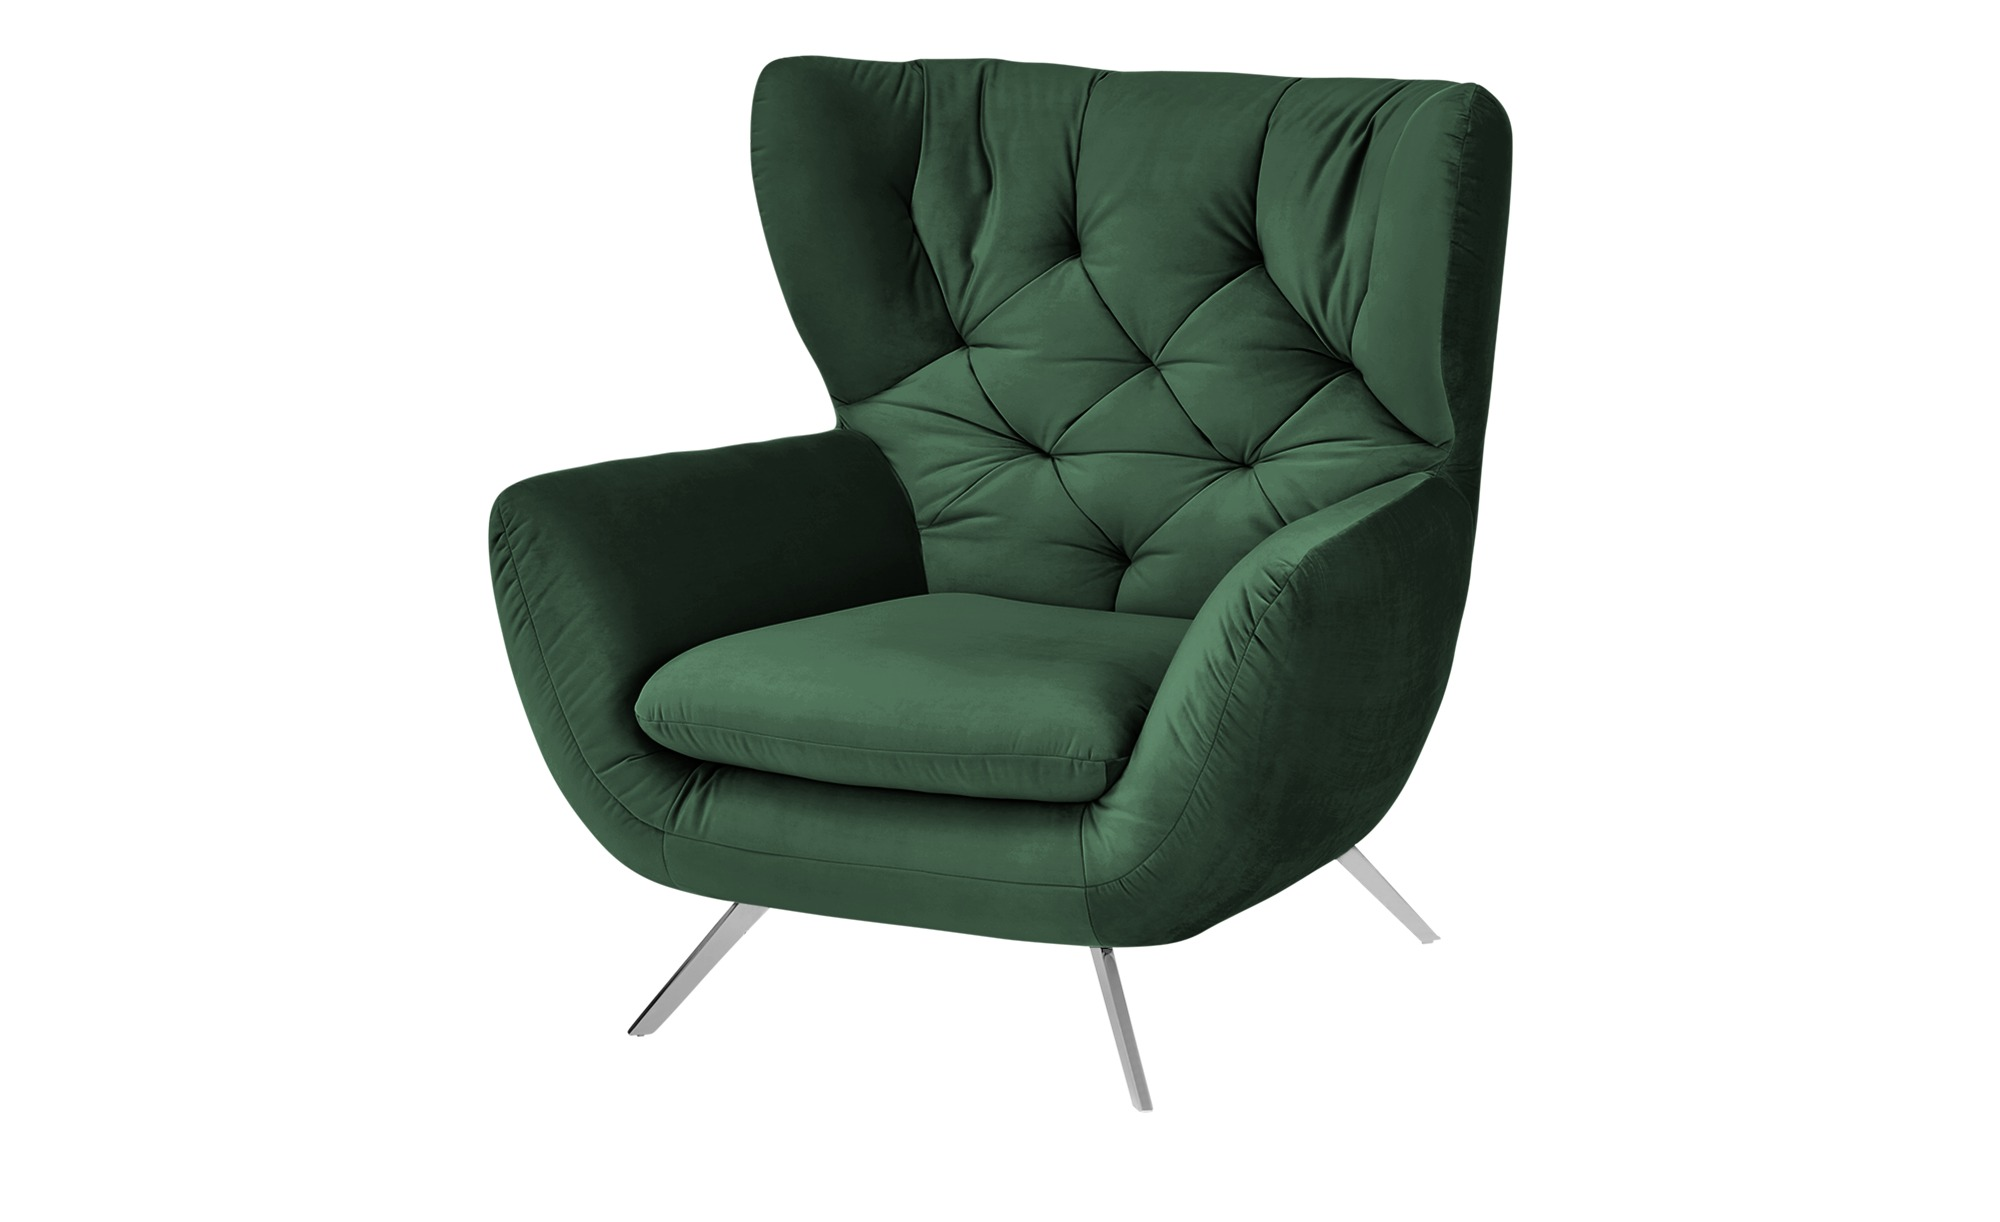 Hochlehnsessel  Caldara ¦ grün ¦ Maße (cm): B: 100 H: 106 T: 95 Polstermöbel > Sessel > Polstersessel - Höffner